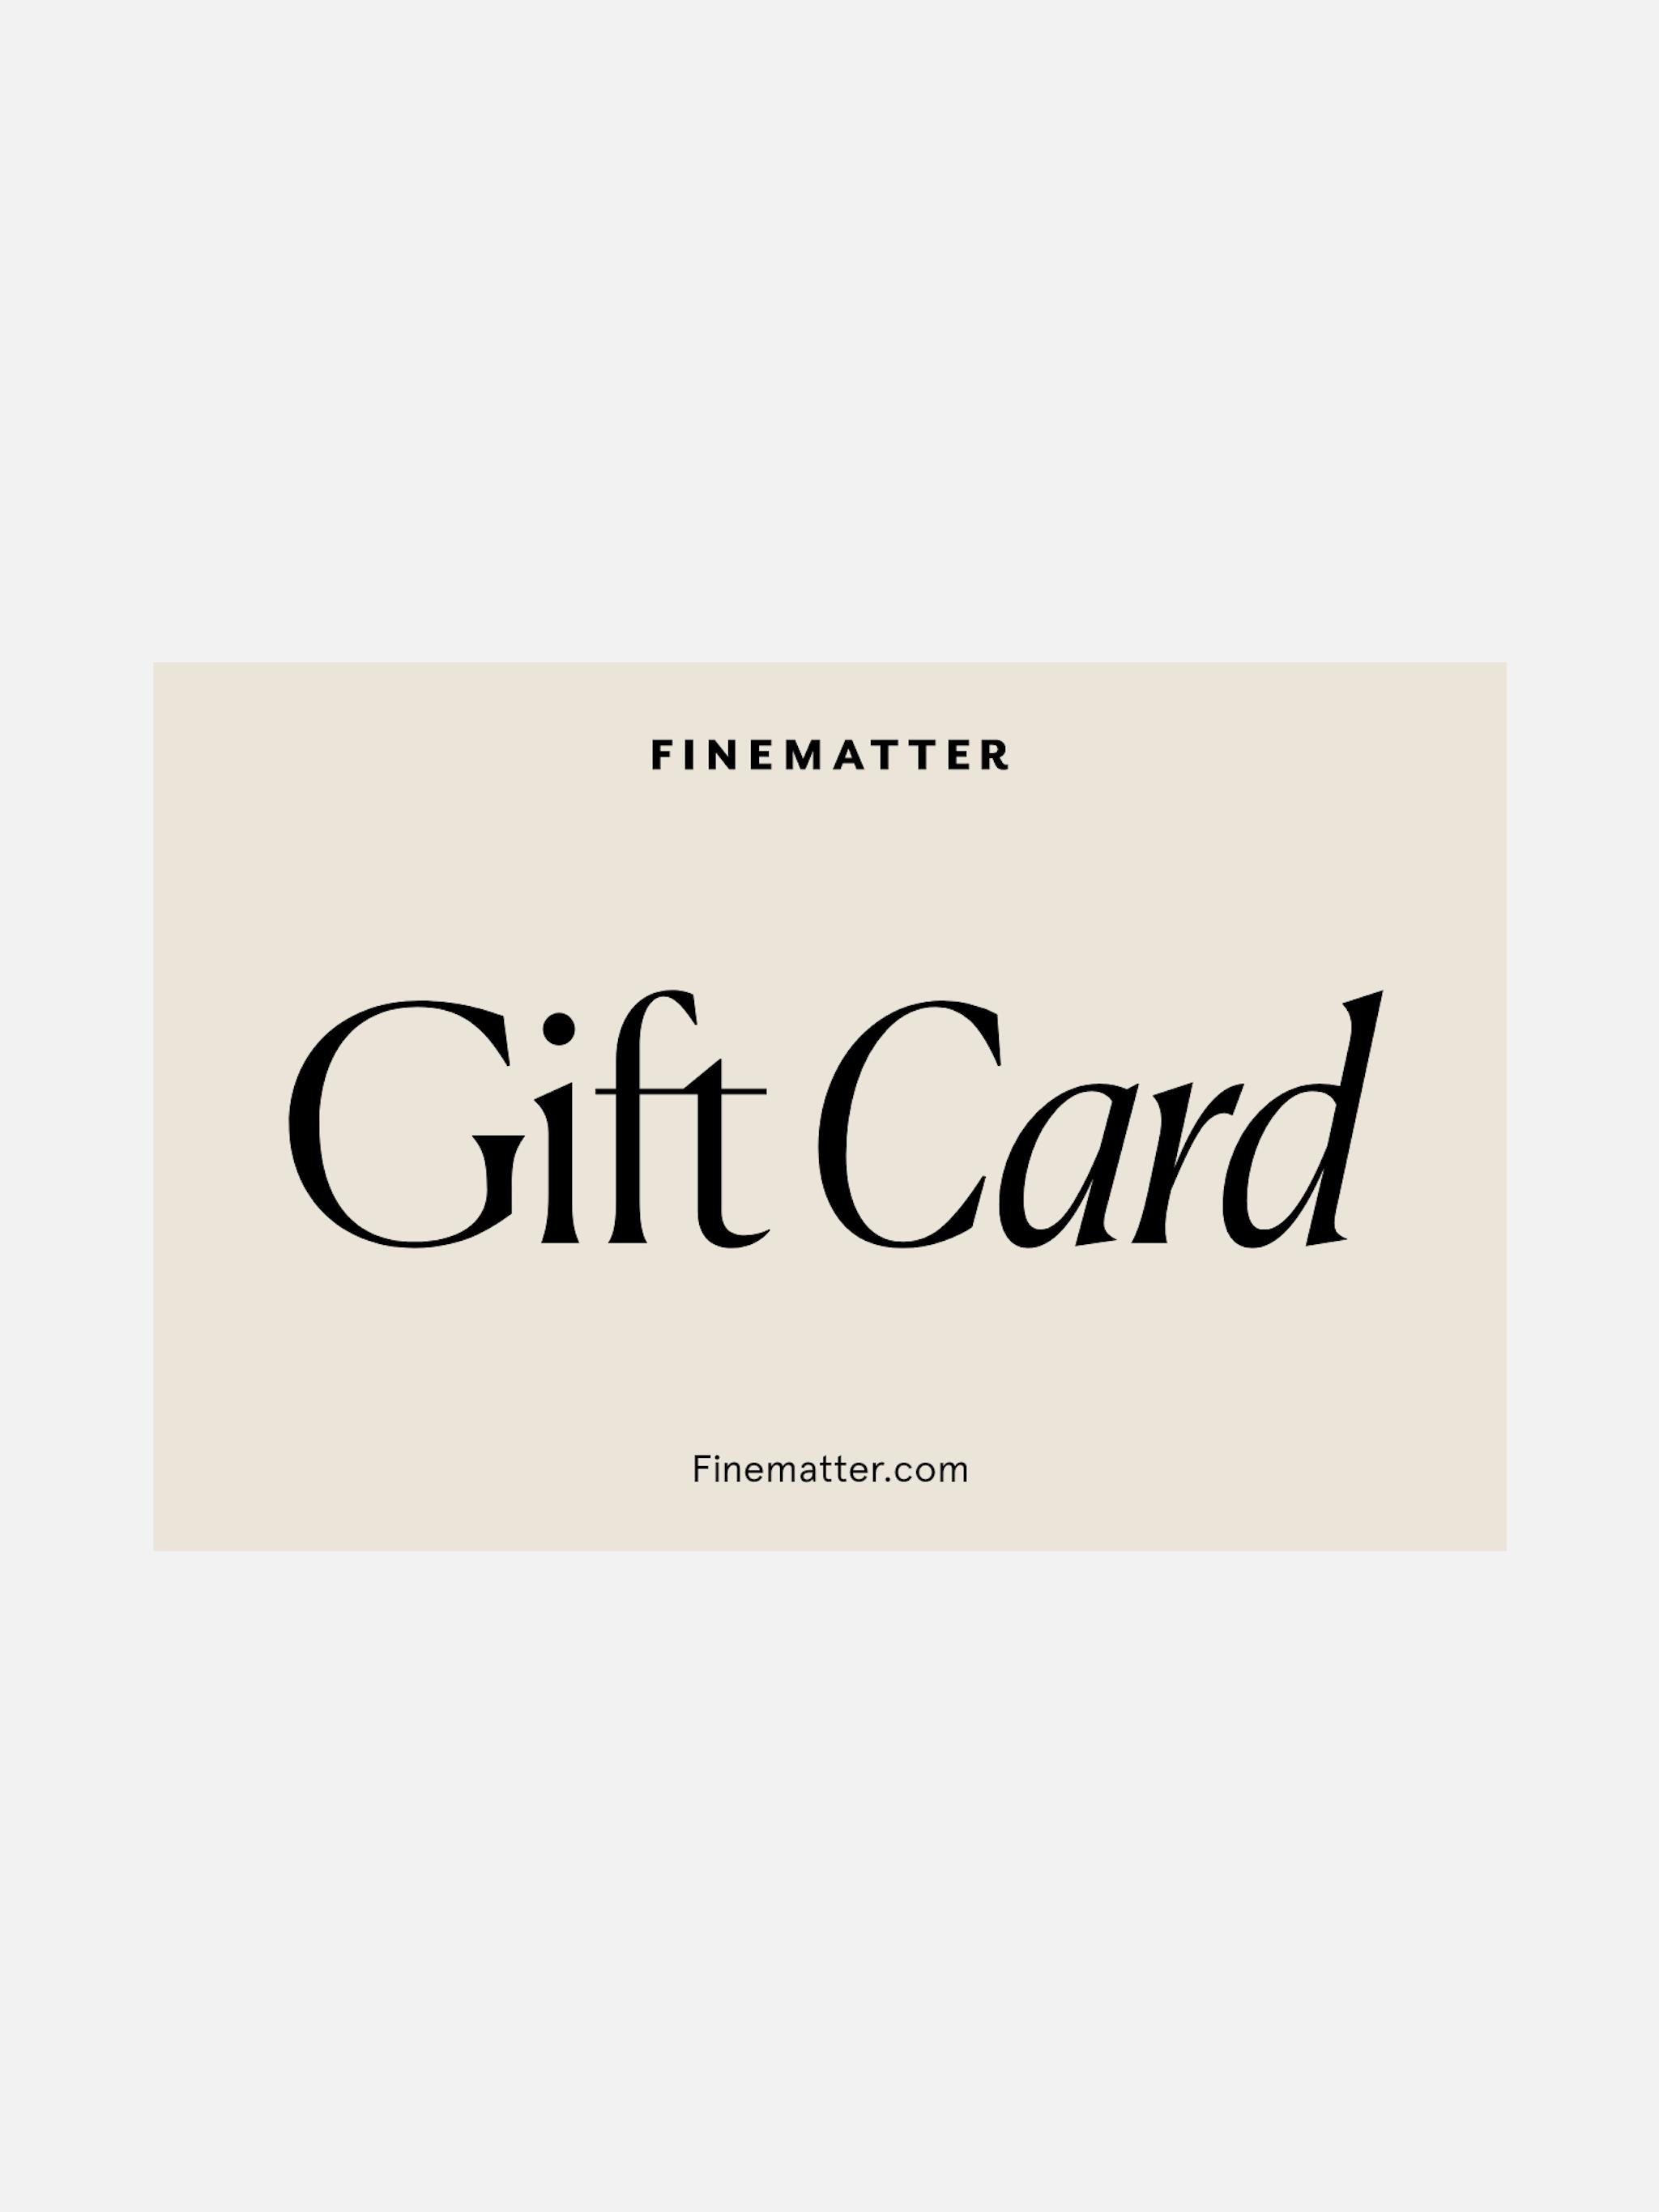 Gift card photo 1